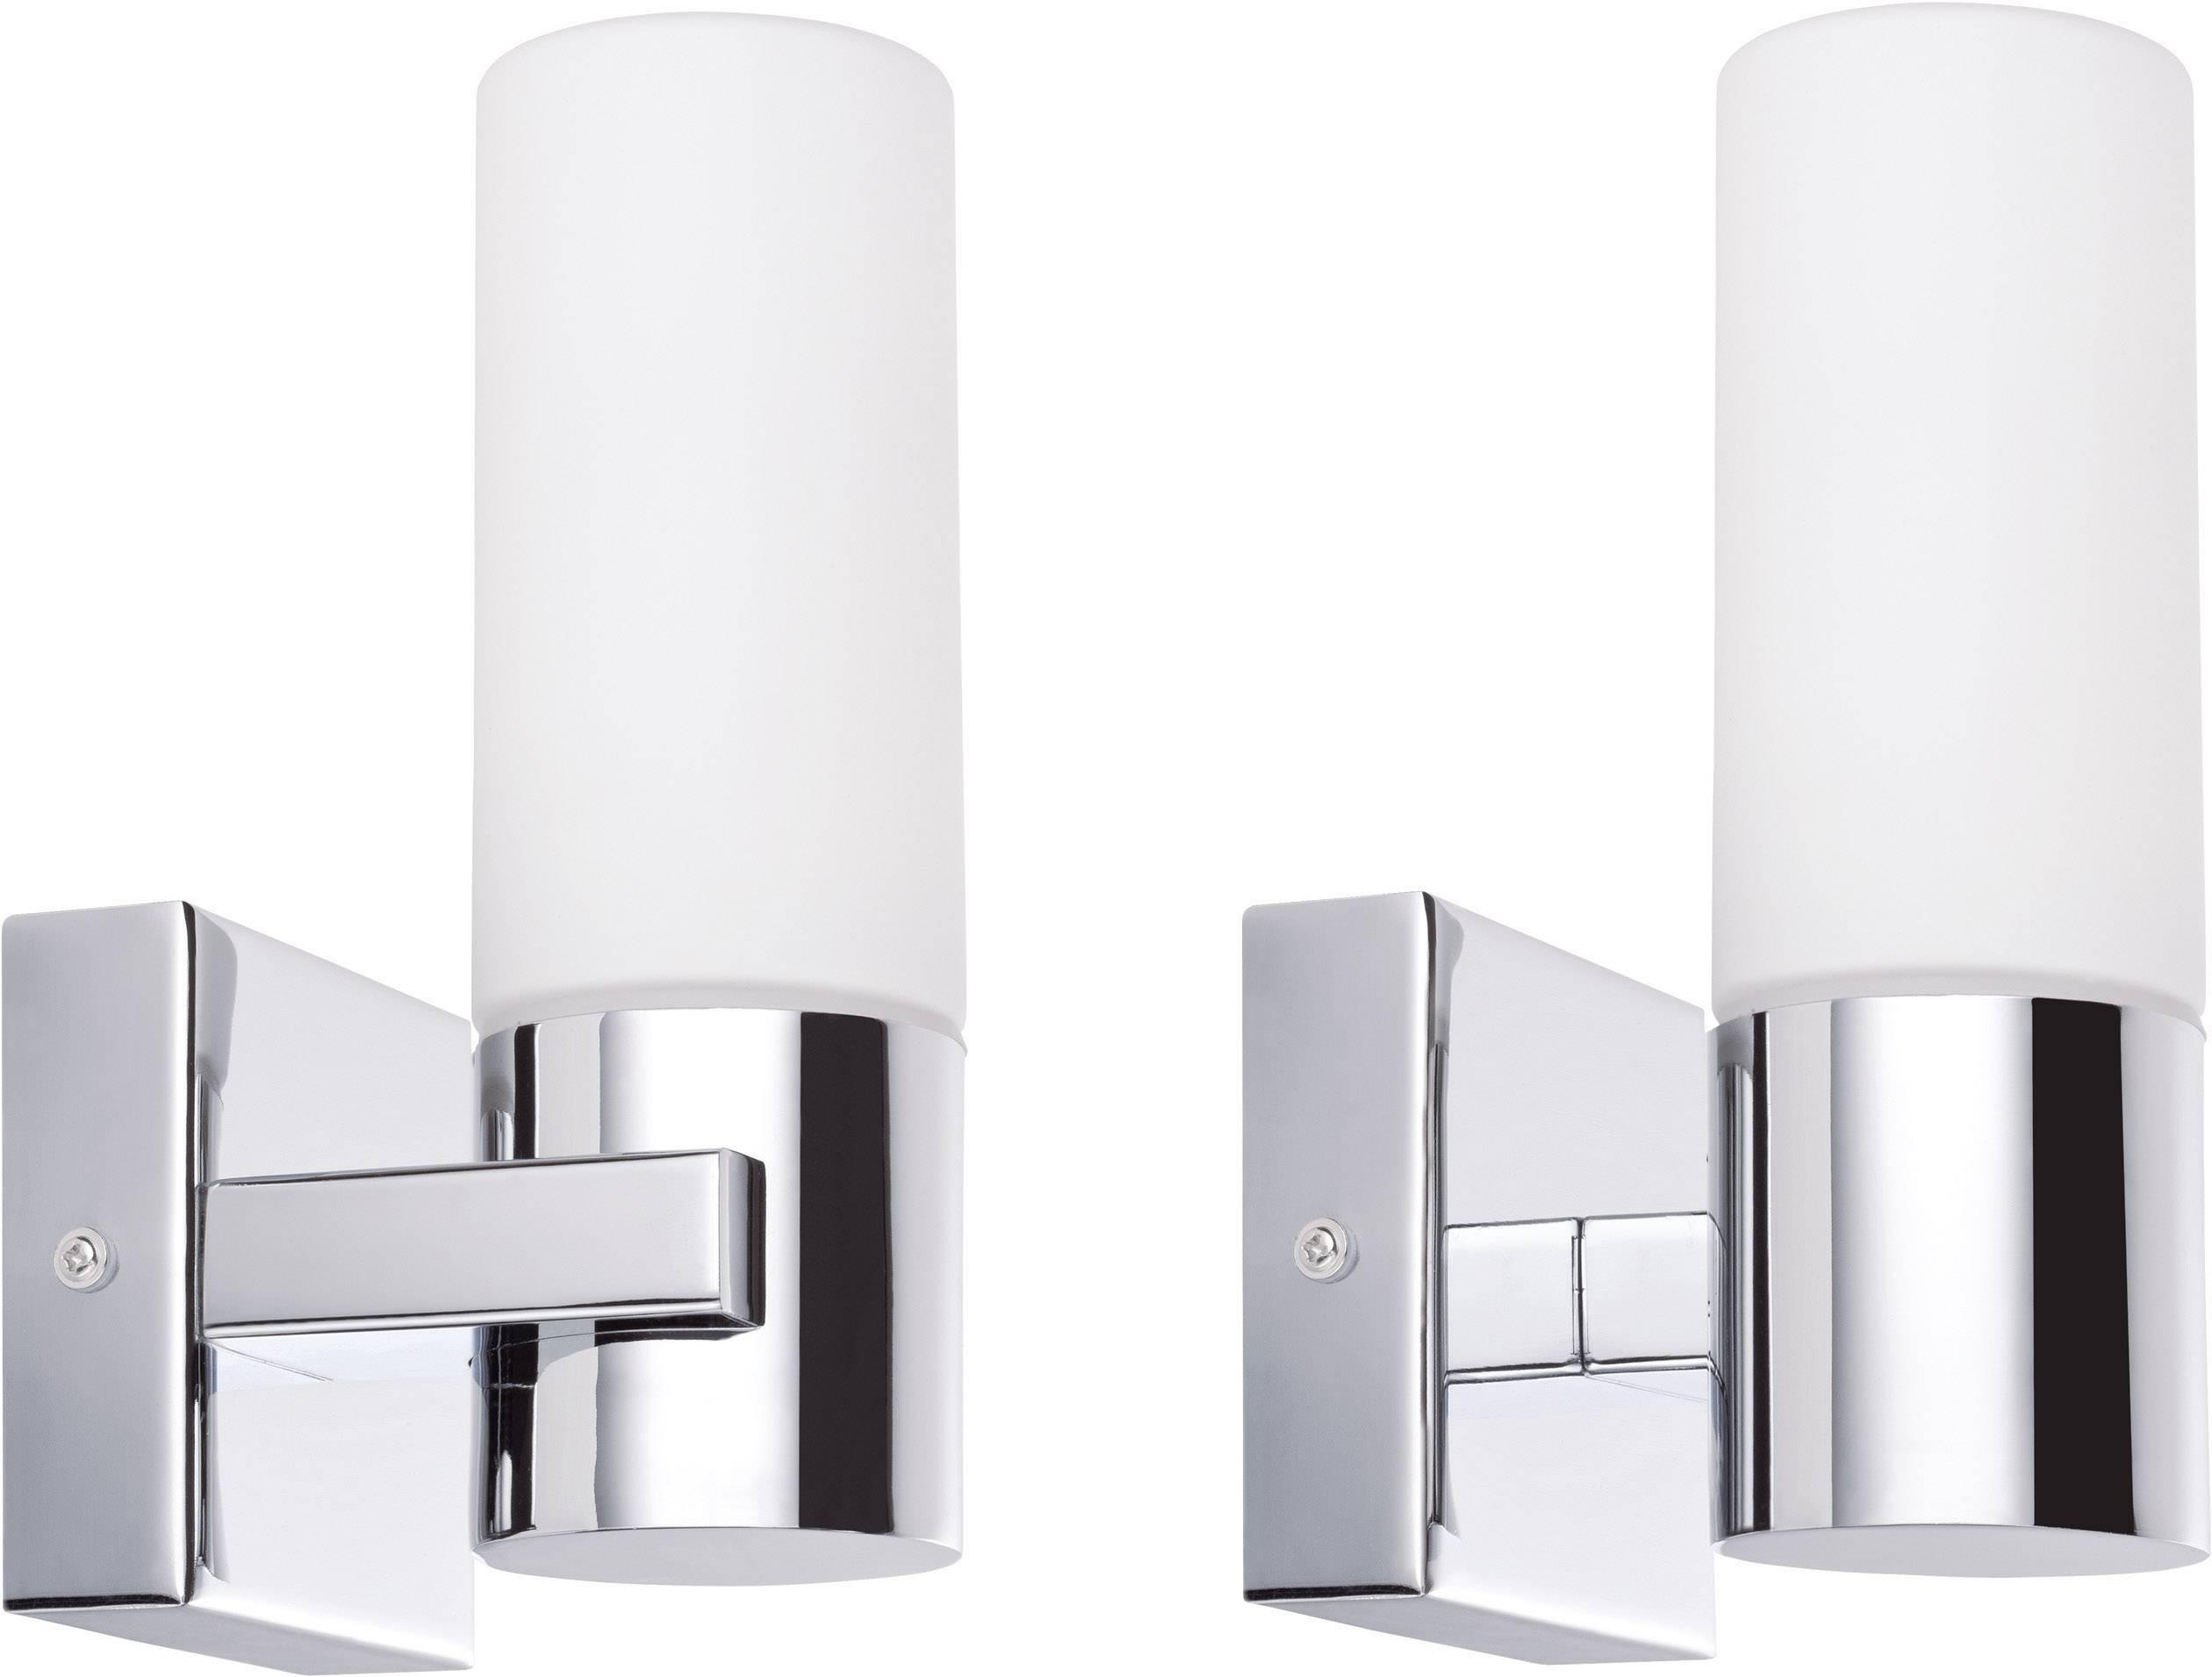 Leen Bakker Badkamer : Badkamer kast spiegel goedkoop badmeubel badkamerspiegel folder